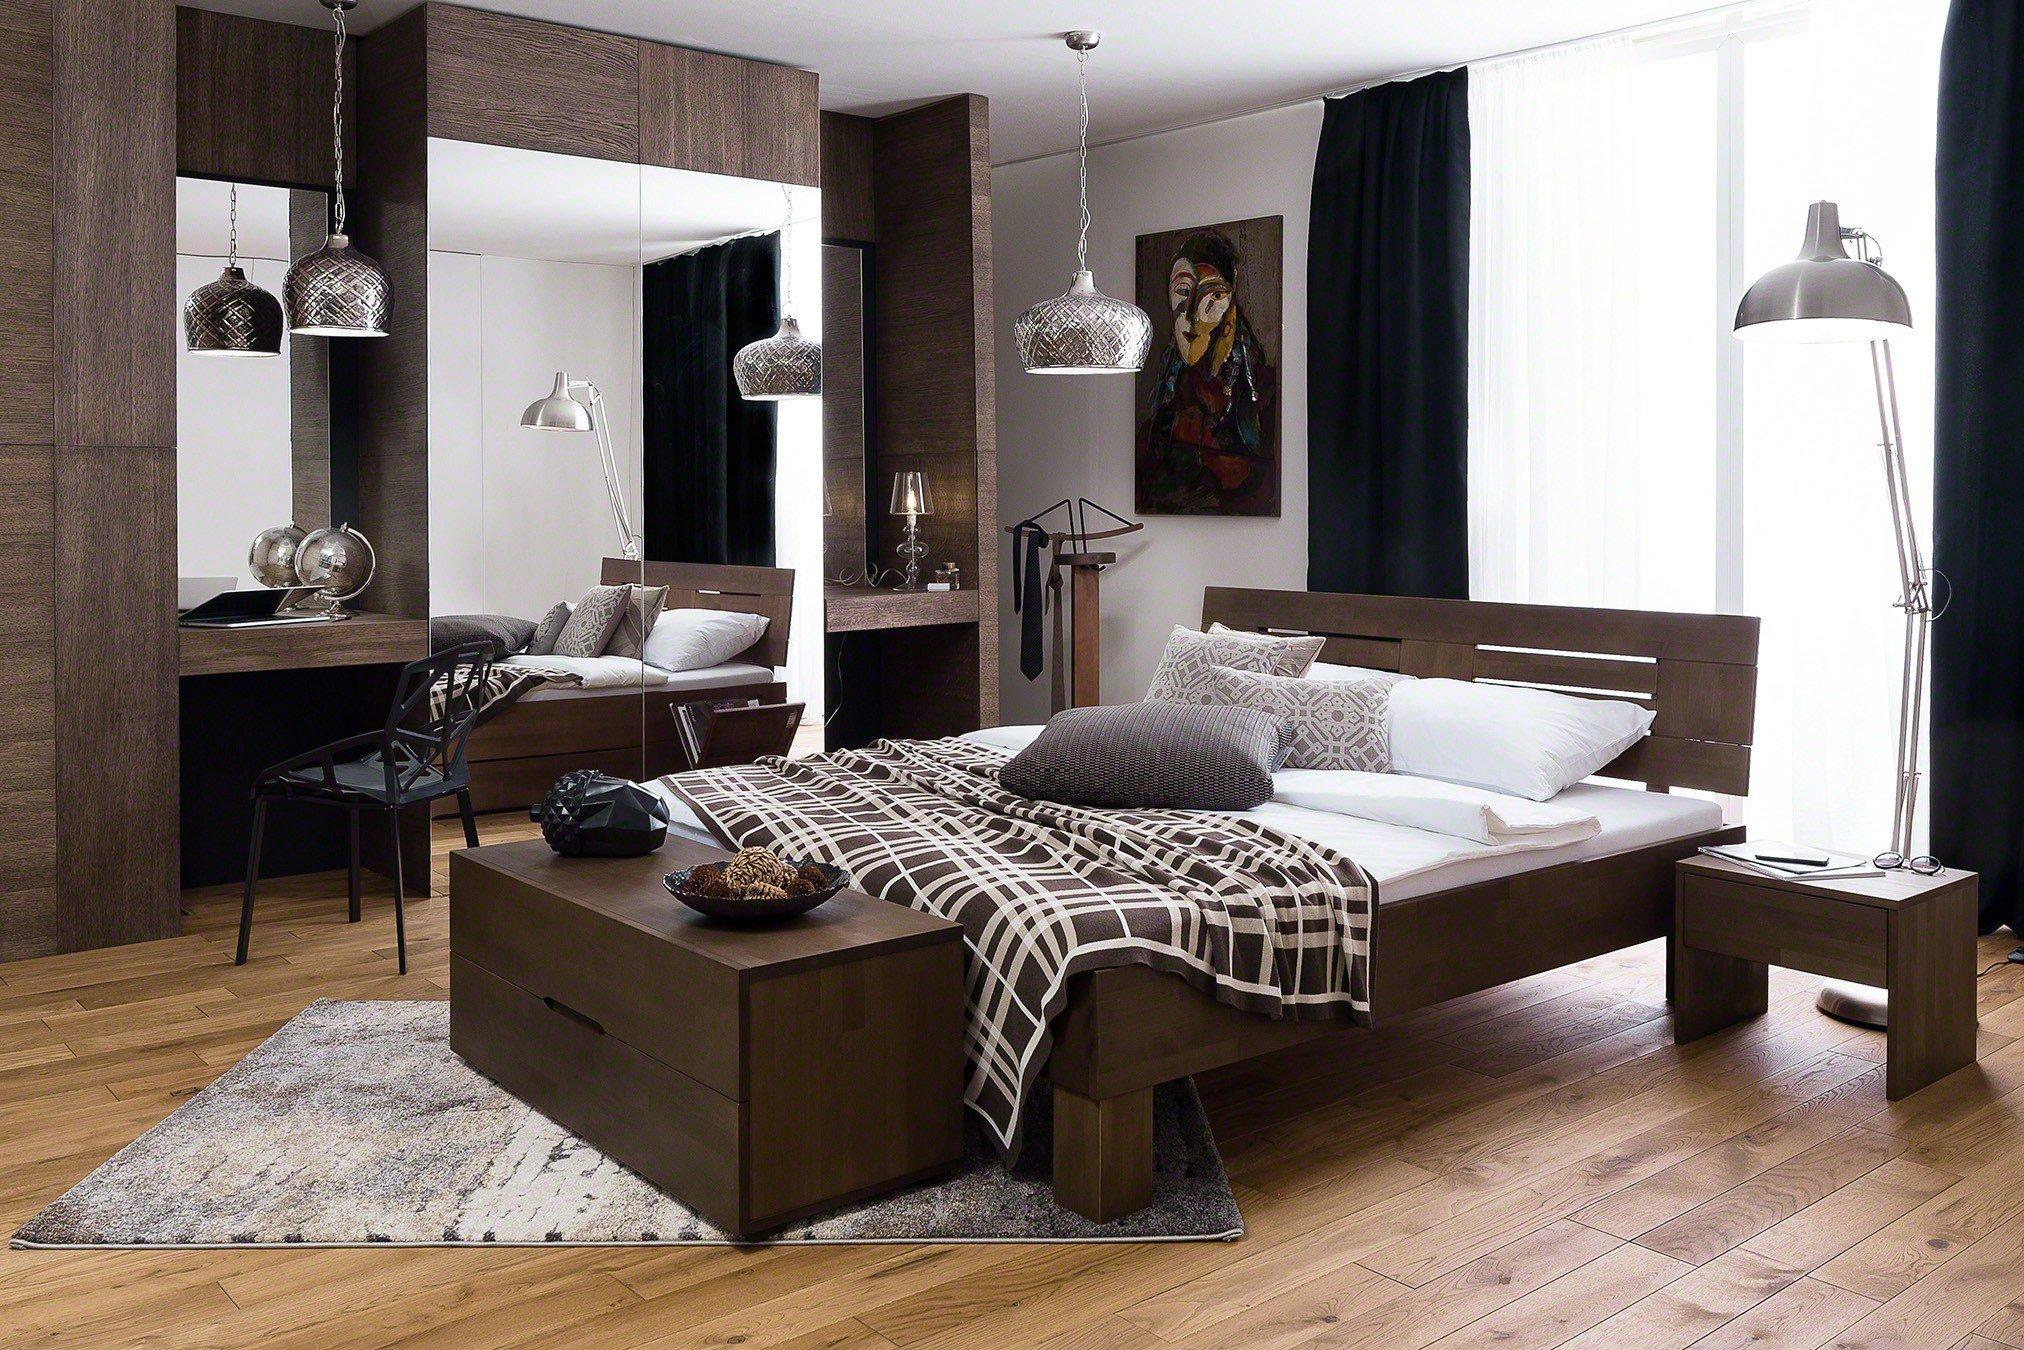 dico m bel holzbett classic buche wenge m bel letz ihr online shop. Black Bedroom Furniture Sets. Home Design Ideas